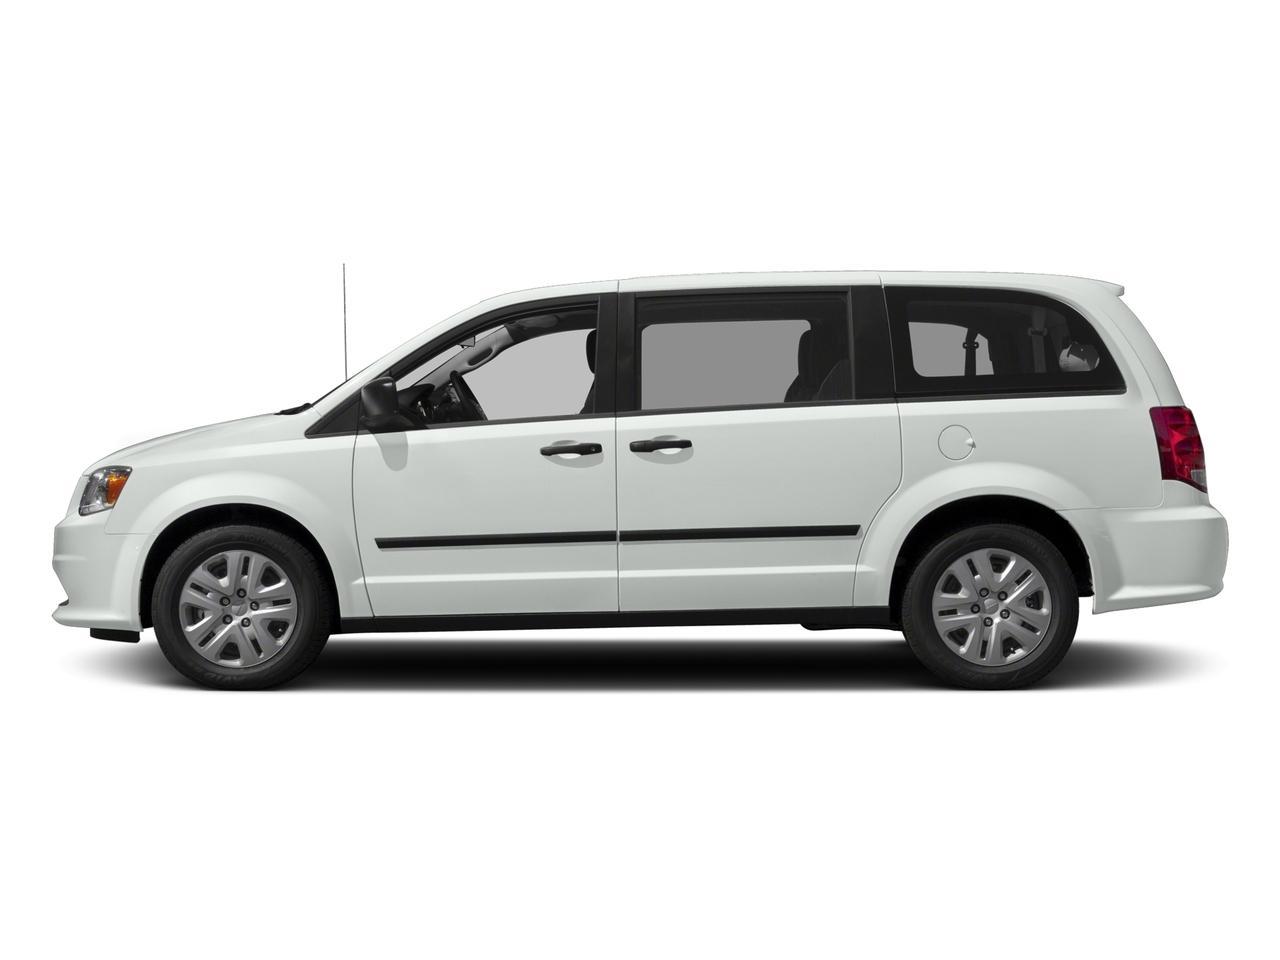 Used 2016 Dodge Grand Caravan SXT with VIN 2C4RDGCGXGR223921 for sale in Park Rapids, Minnesota